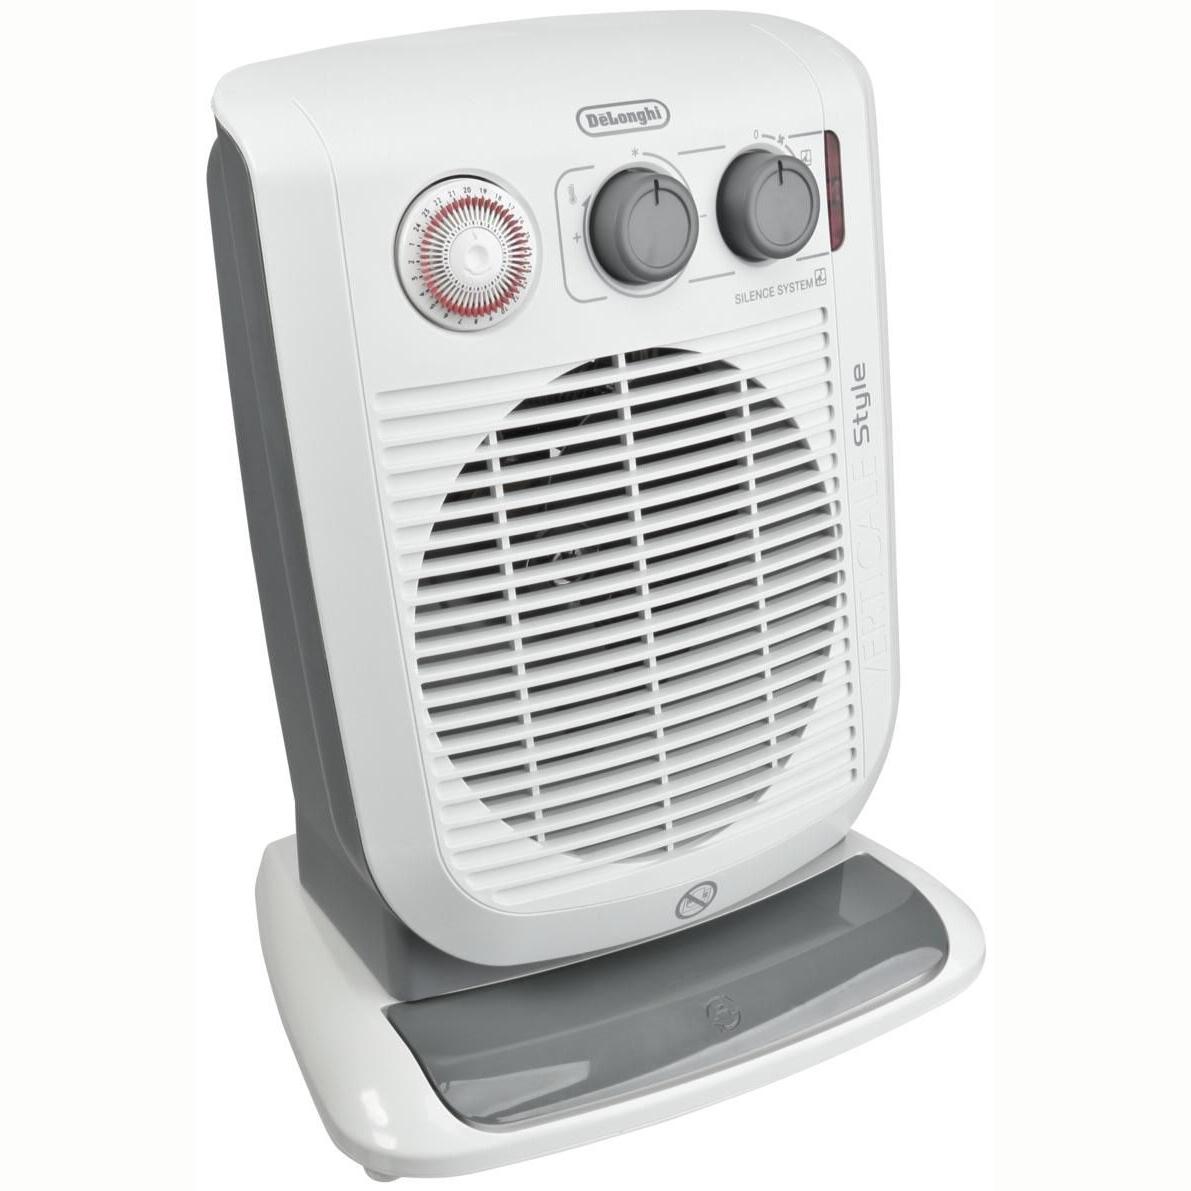 + VAT Brand New Delonghi HVF 3552 TB Upright Fan Heater - 3 Heat Settings - 24 Hour Timer -